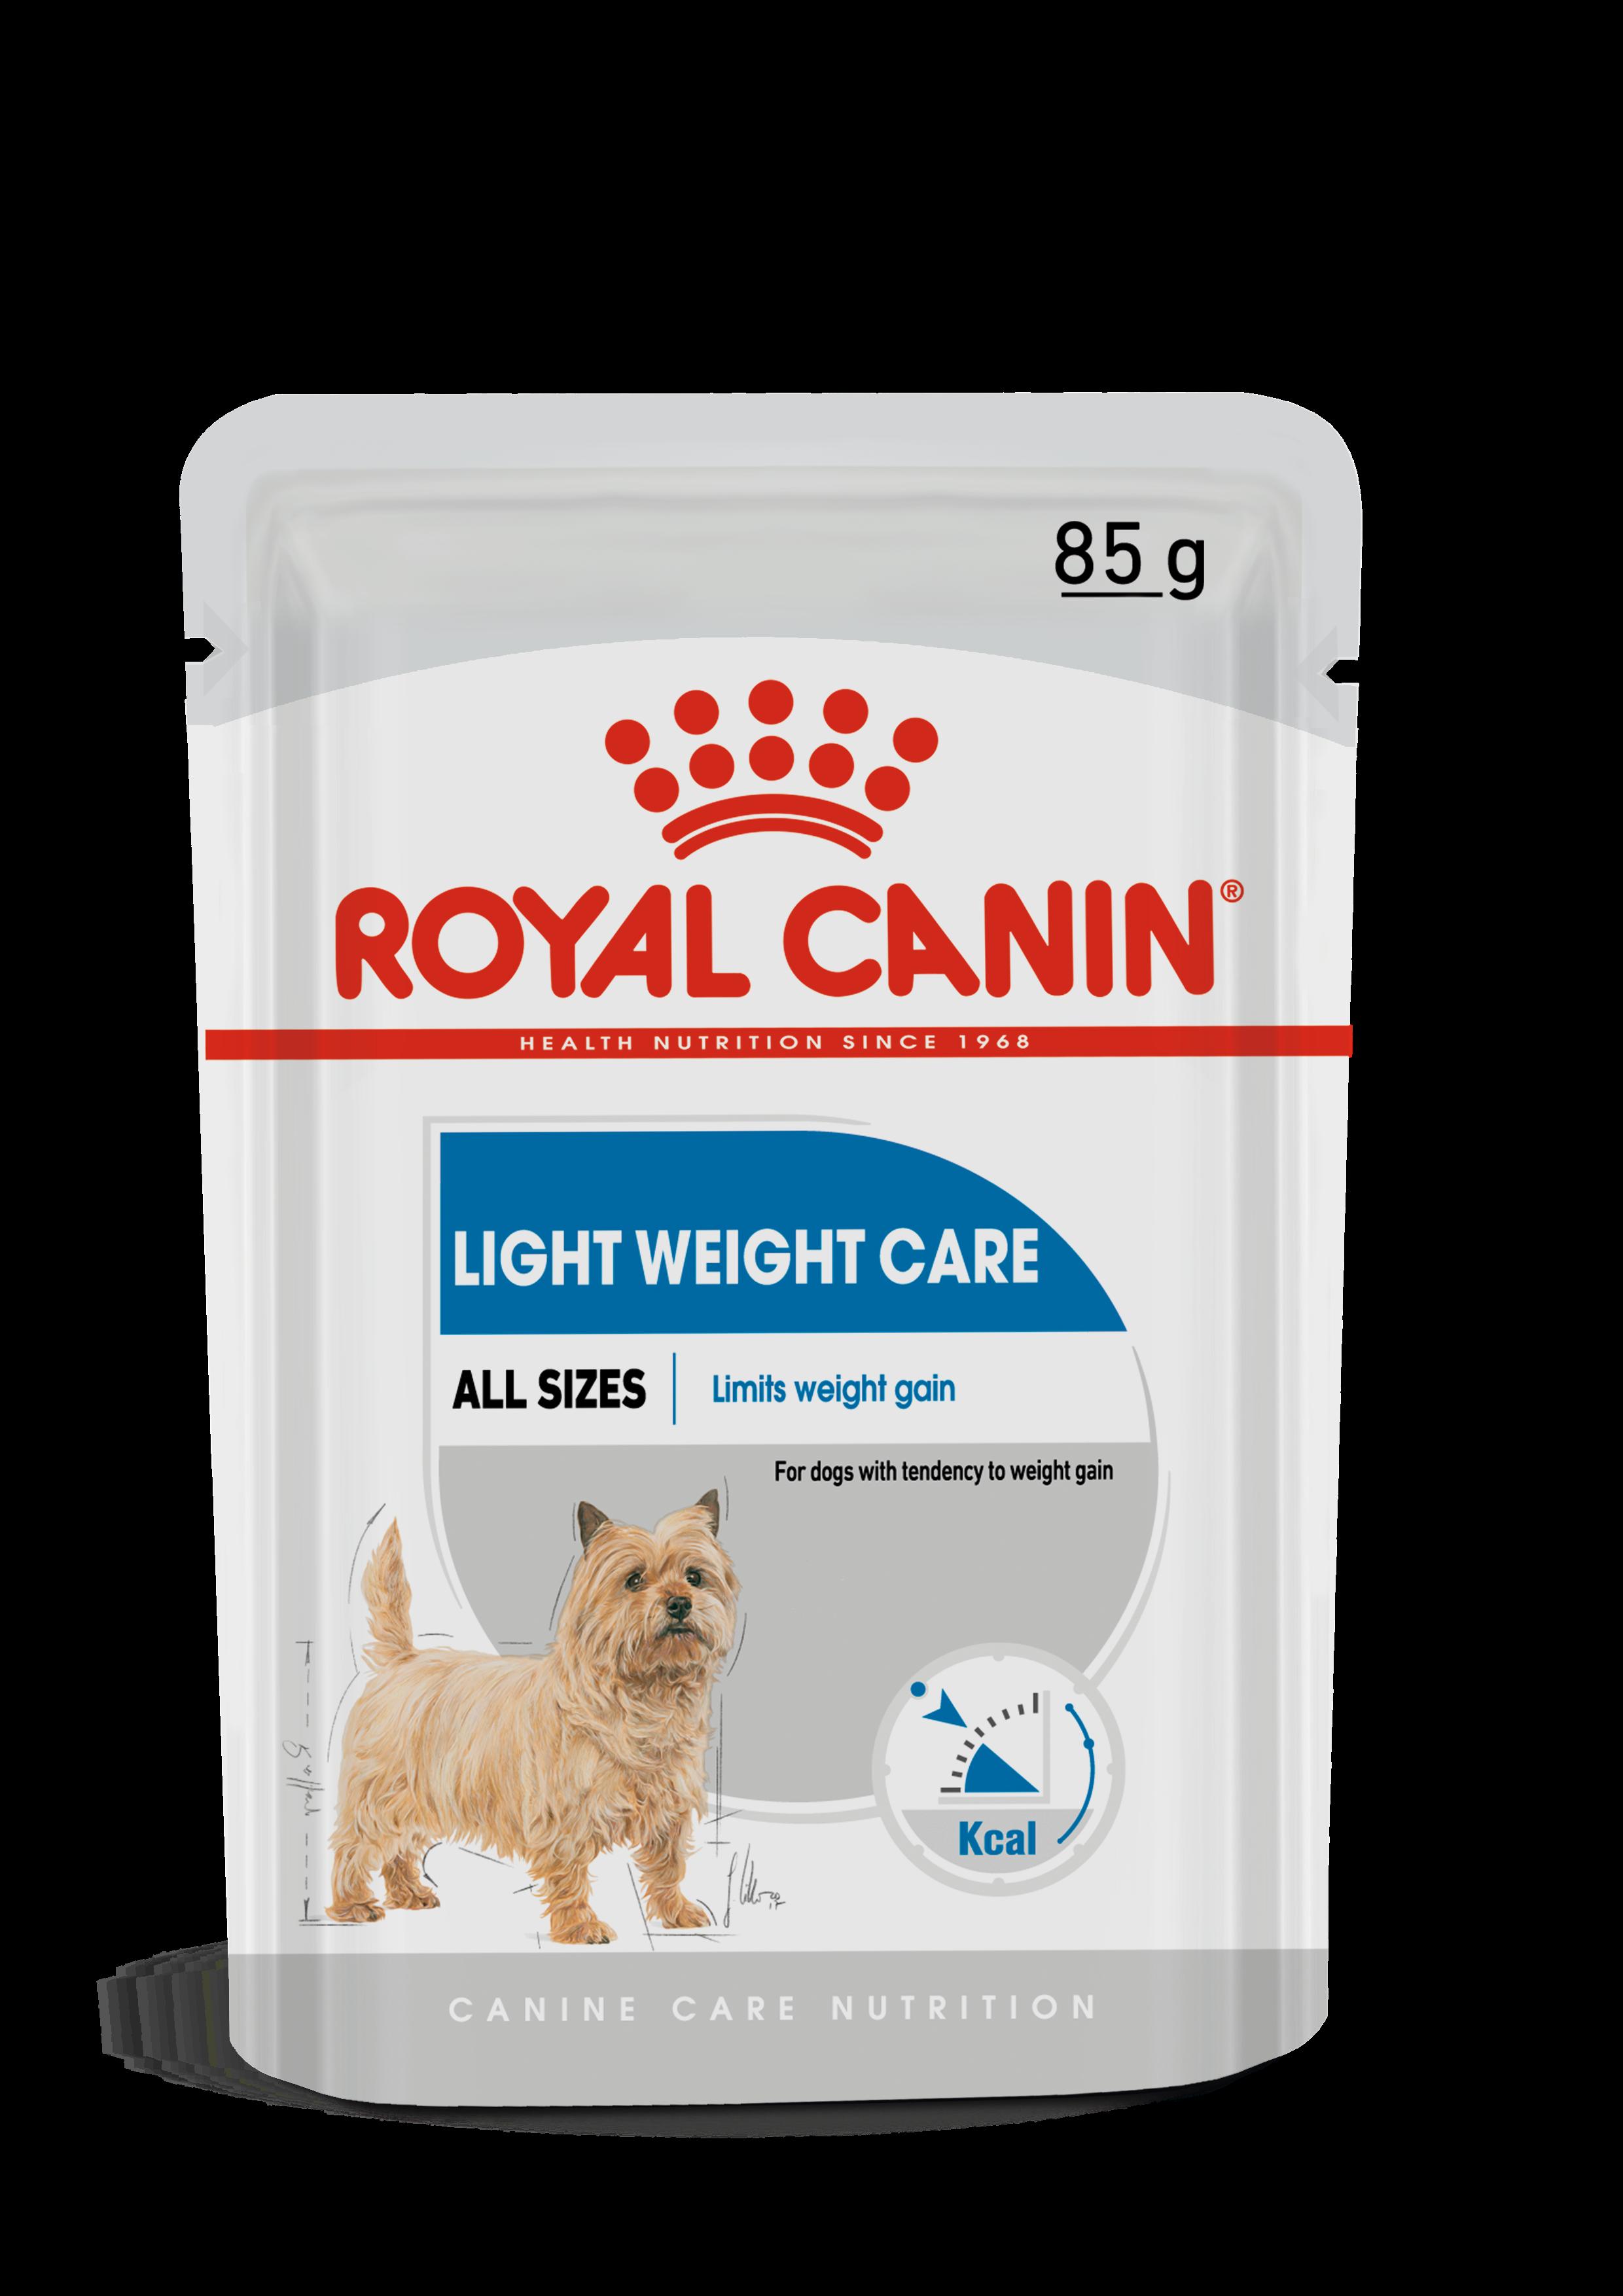 Canine Care Nutrition Royal Canin